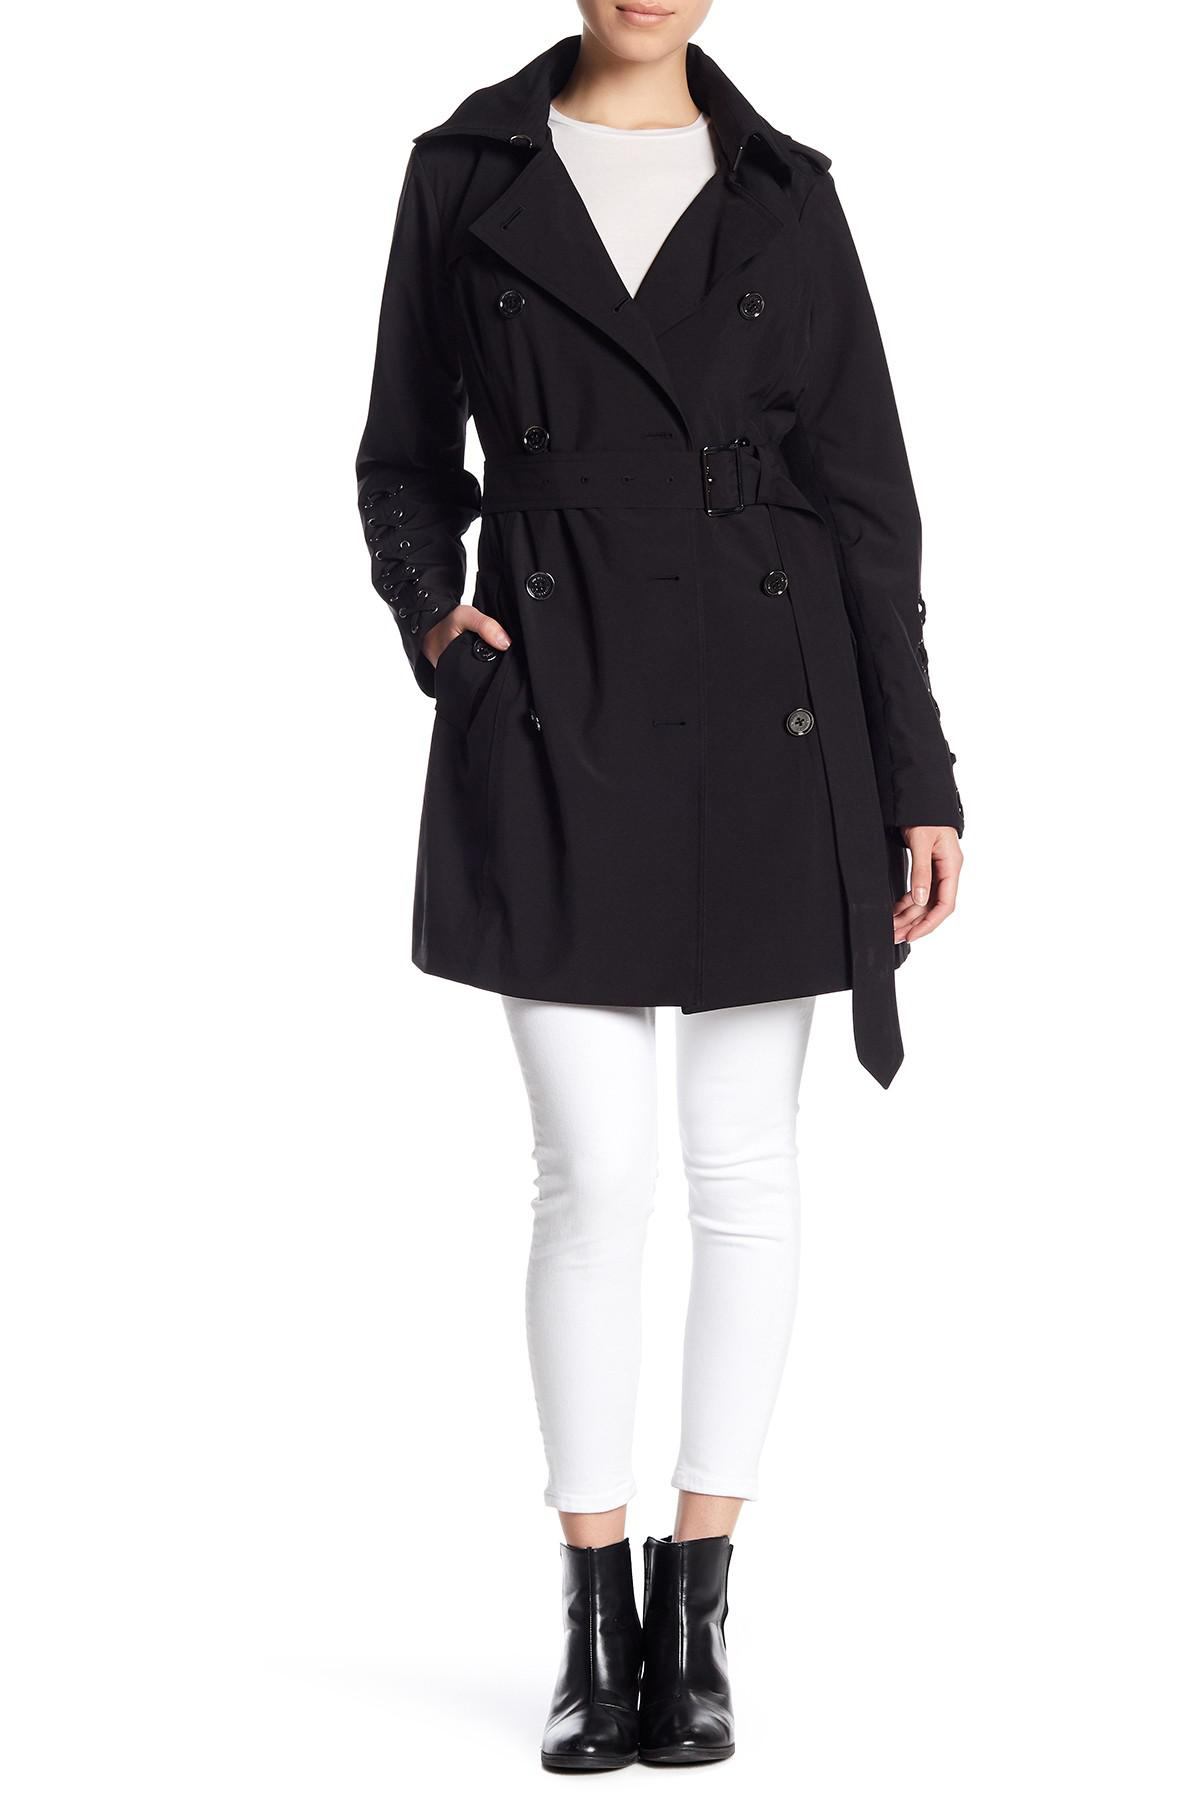 MICHAEL Michael Kors. Women's Black Lace Up Sleeve Trench Coat